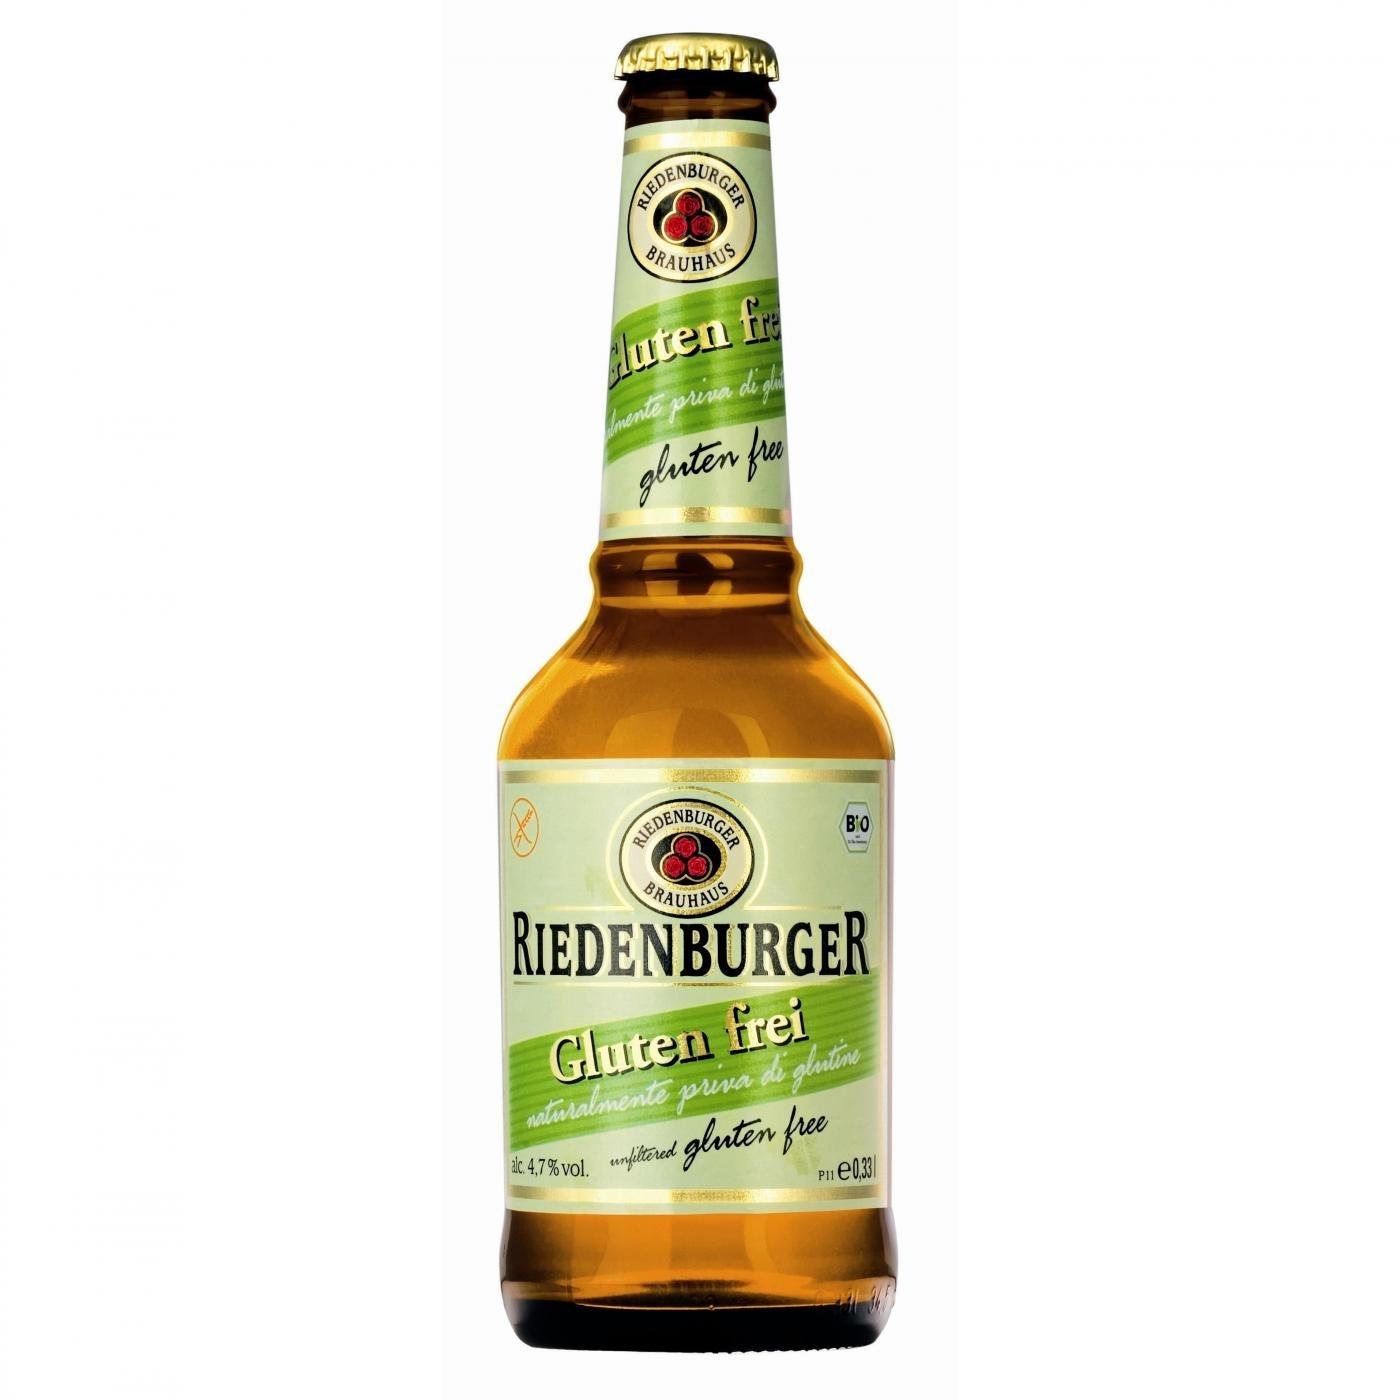 Cervesa sense gluten